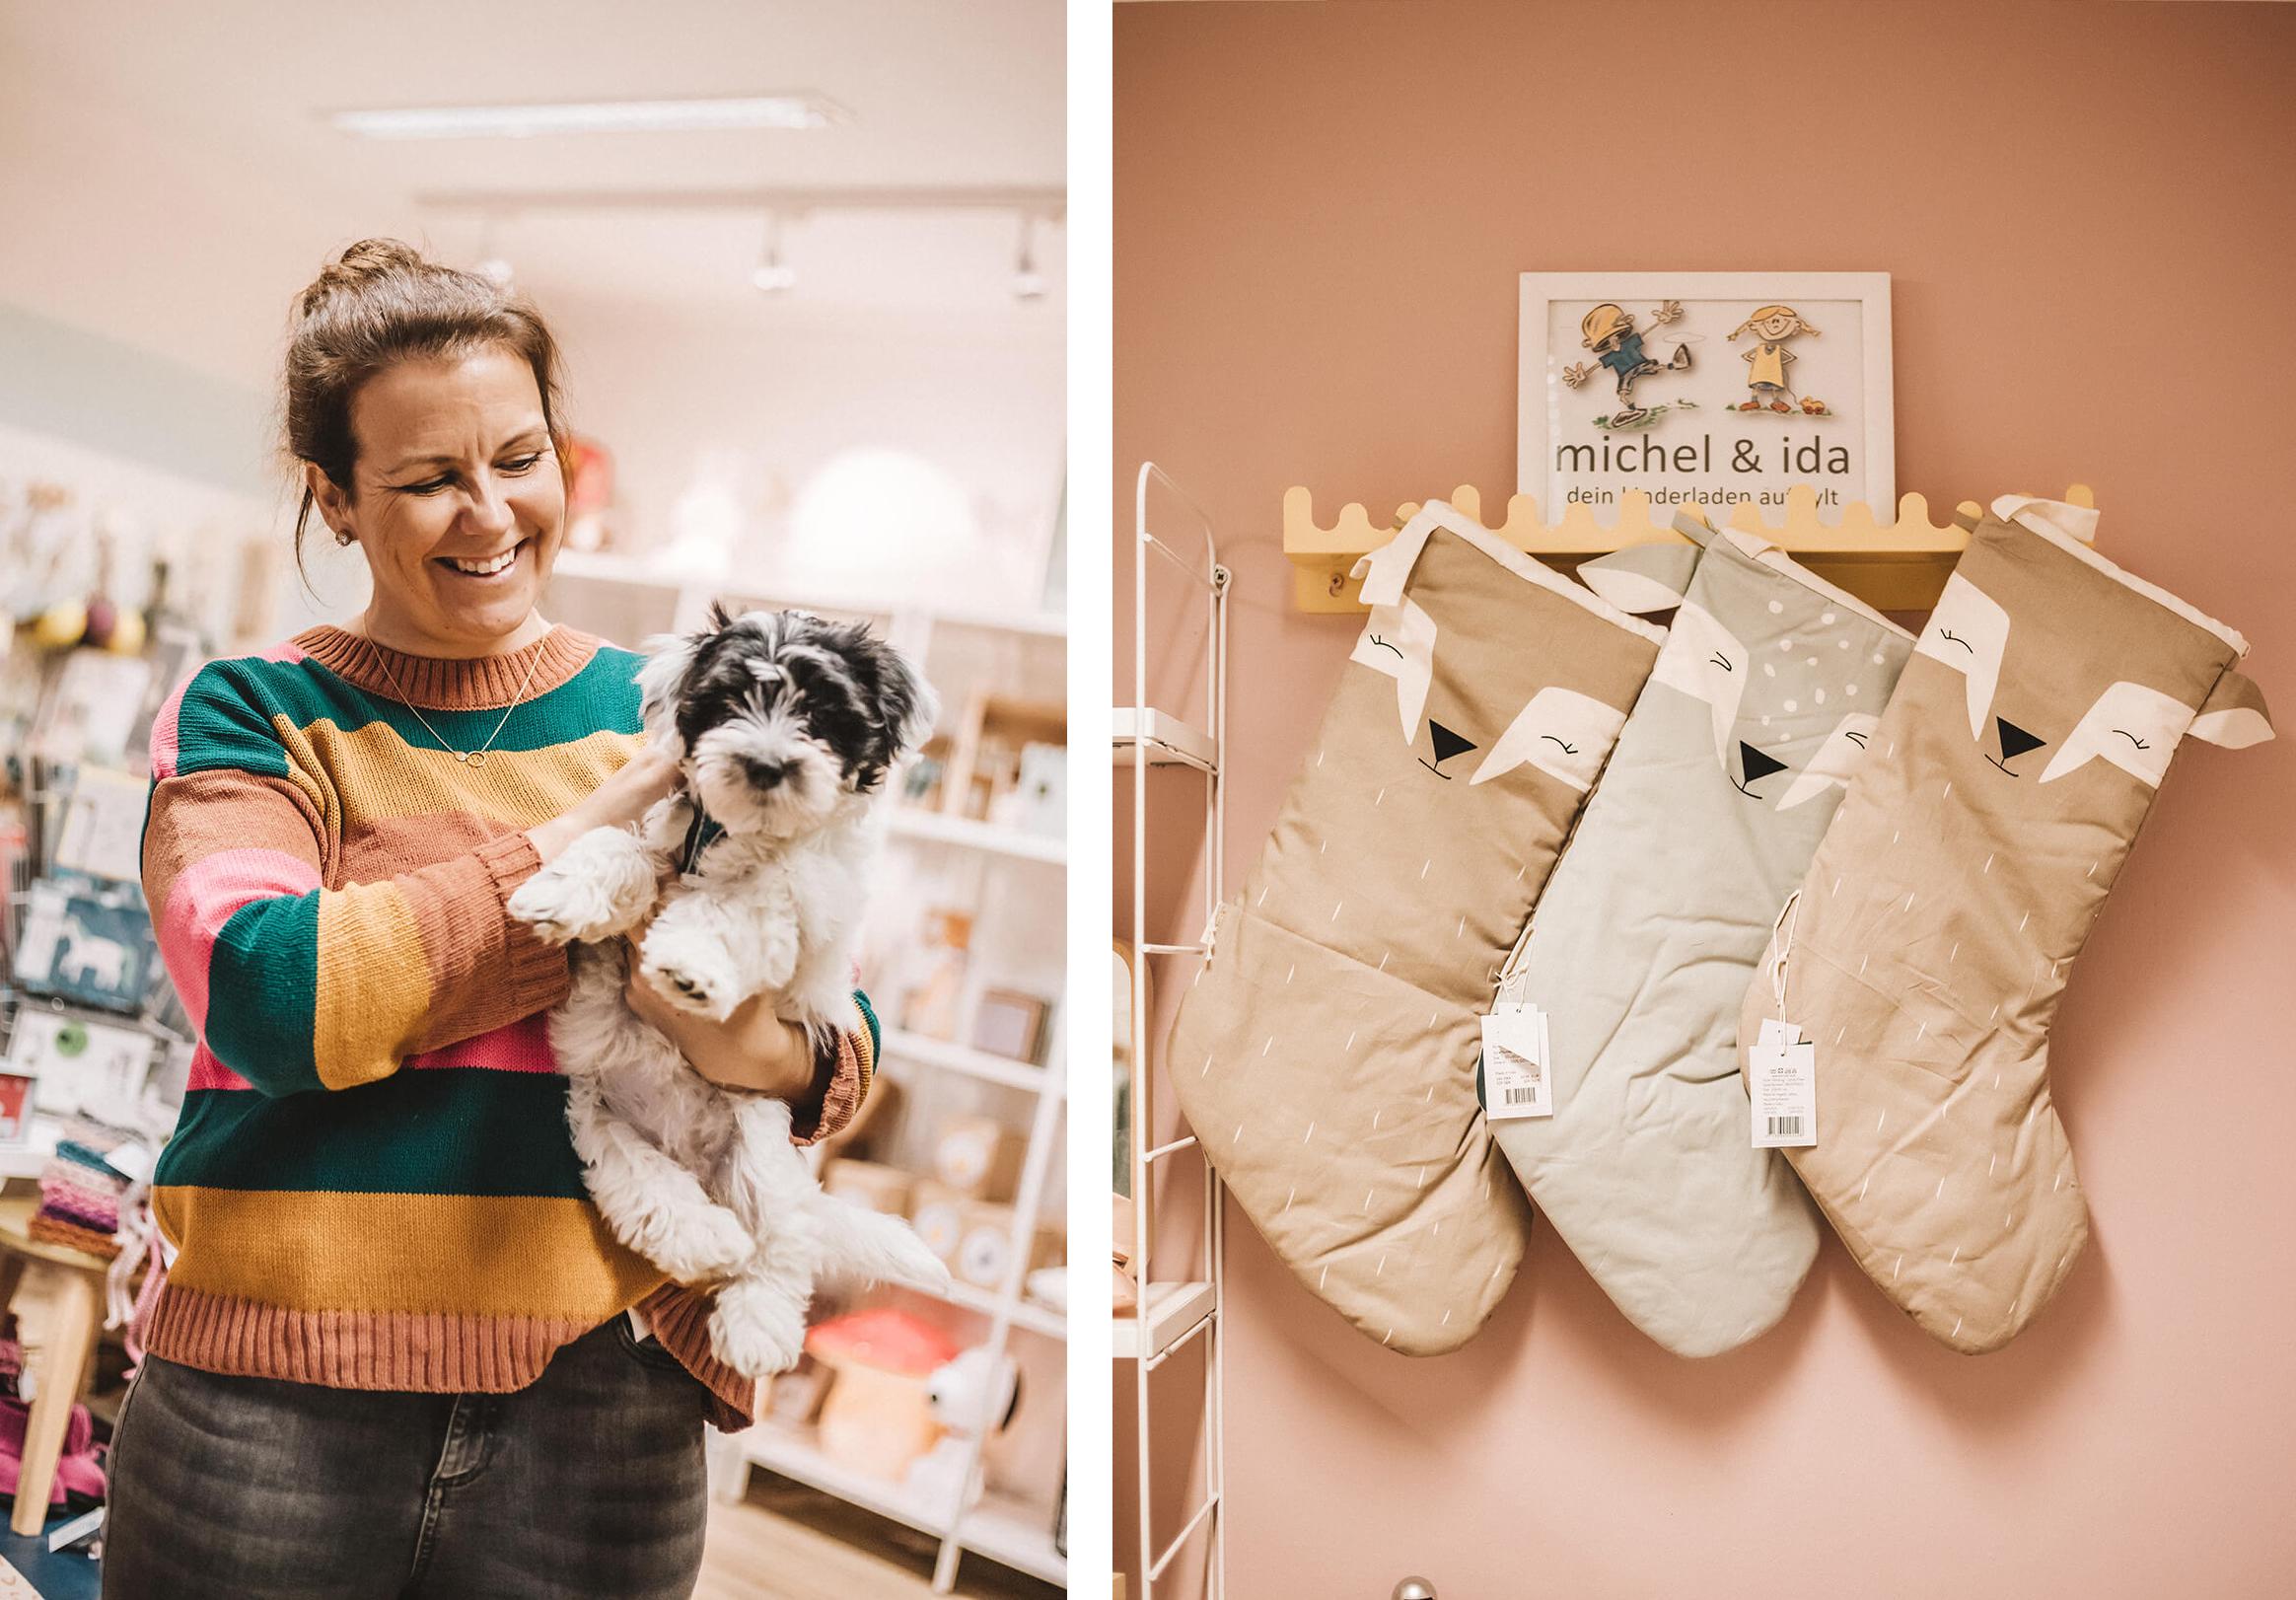 Sylt mit Kindern: kinderladen michel & Ida in Westerland